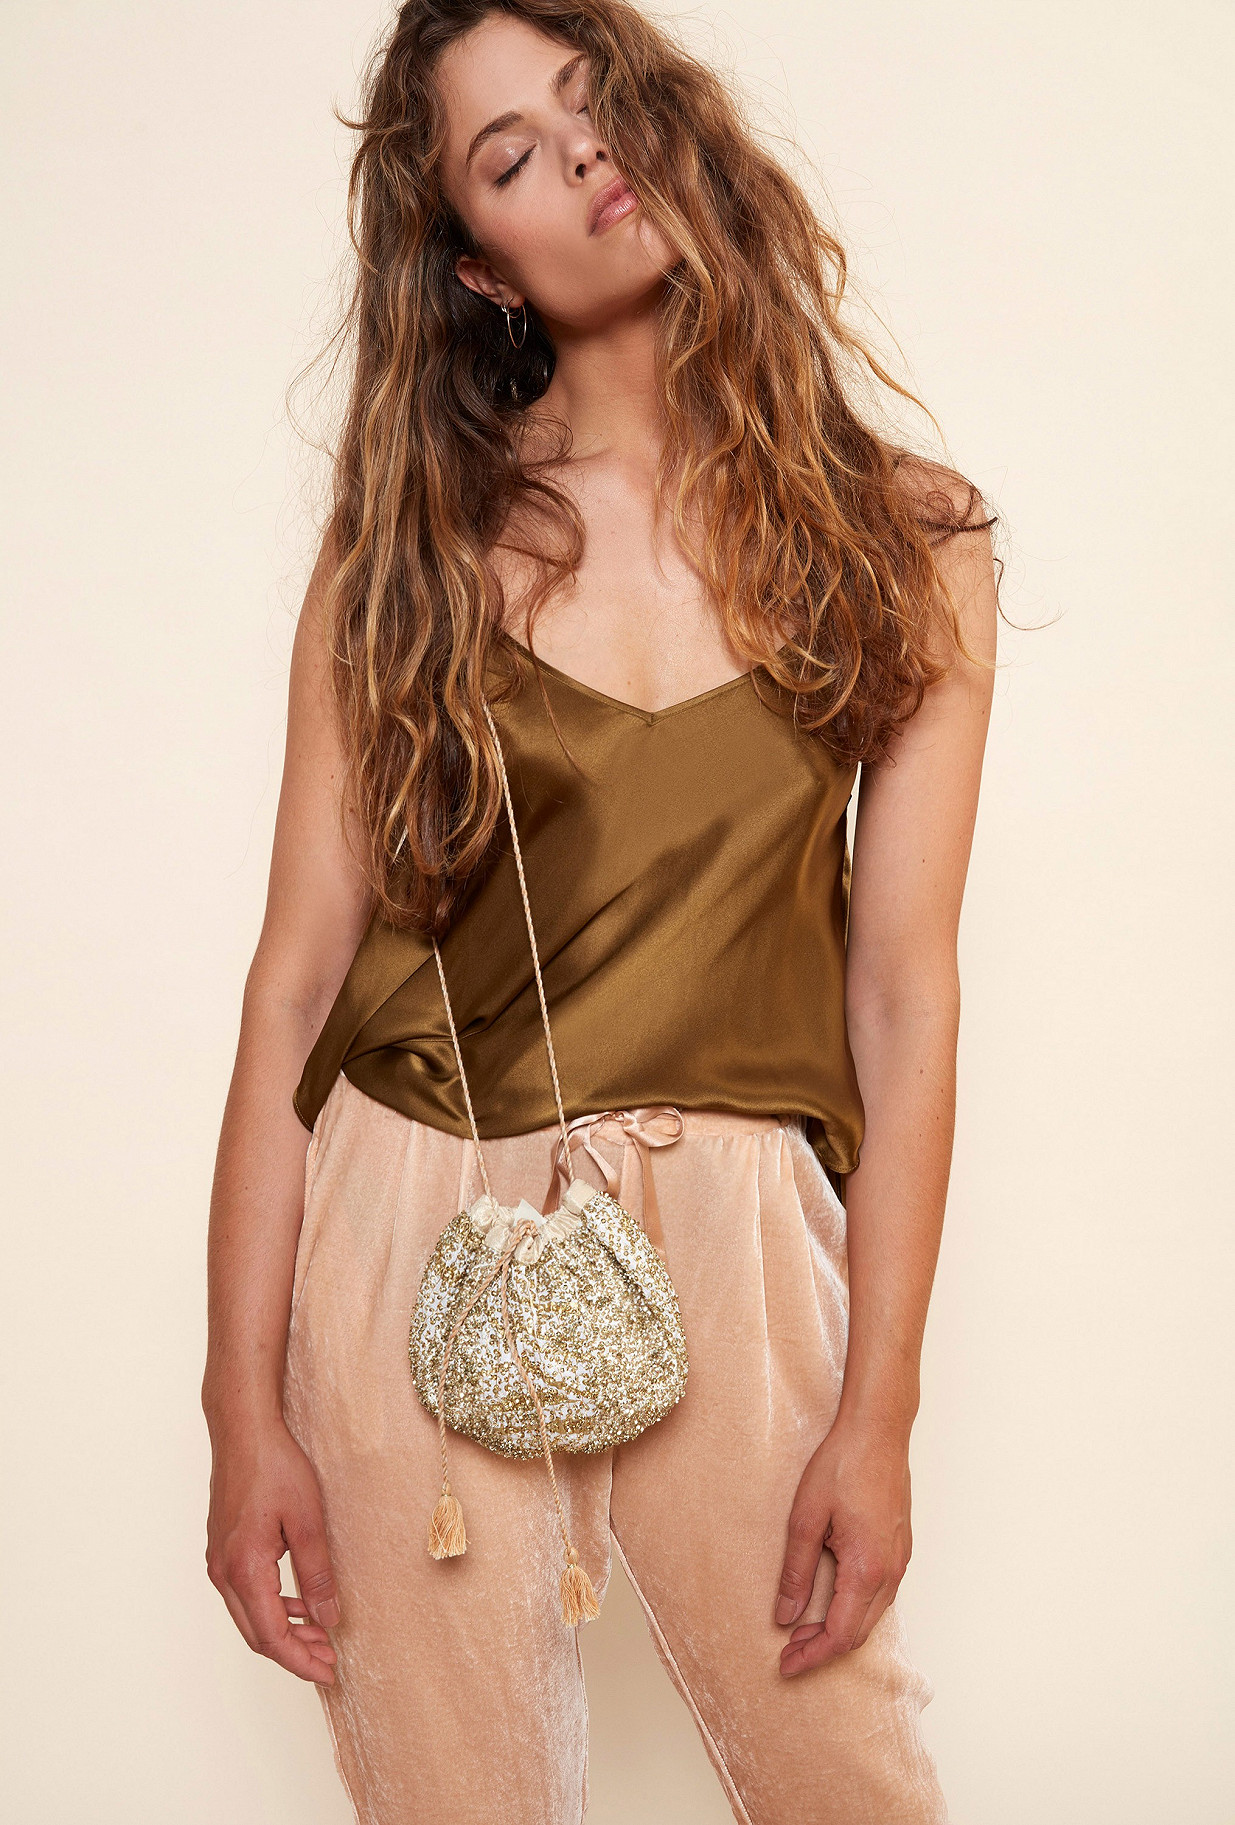 Paris clothes store Bag Sirius french designer fashion Paris